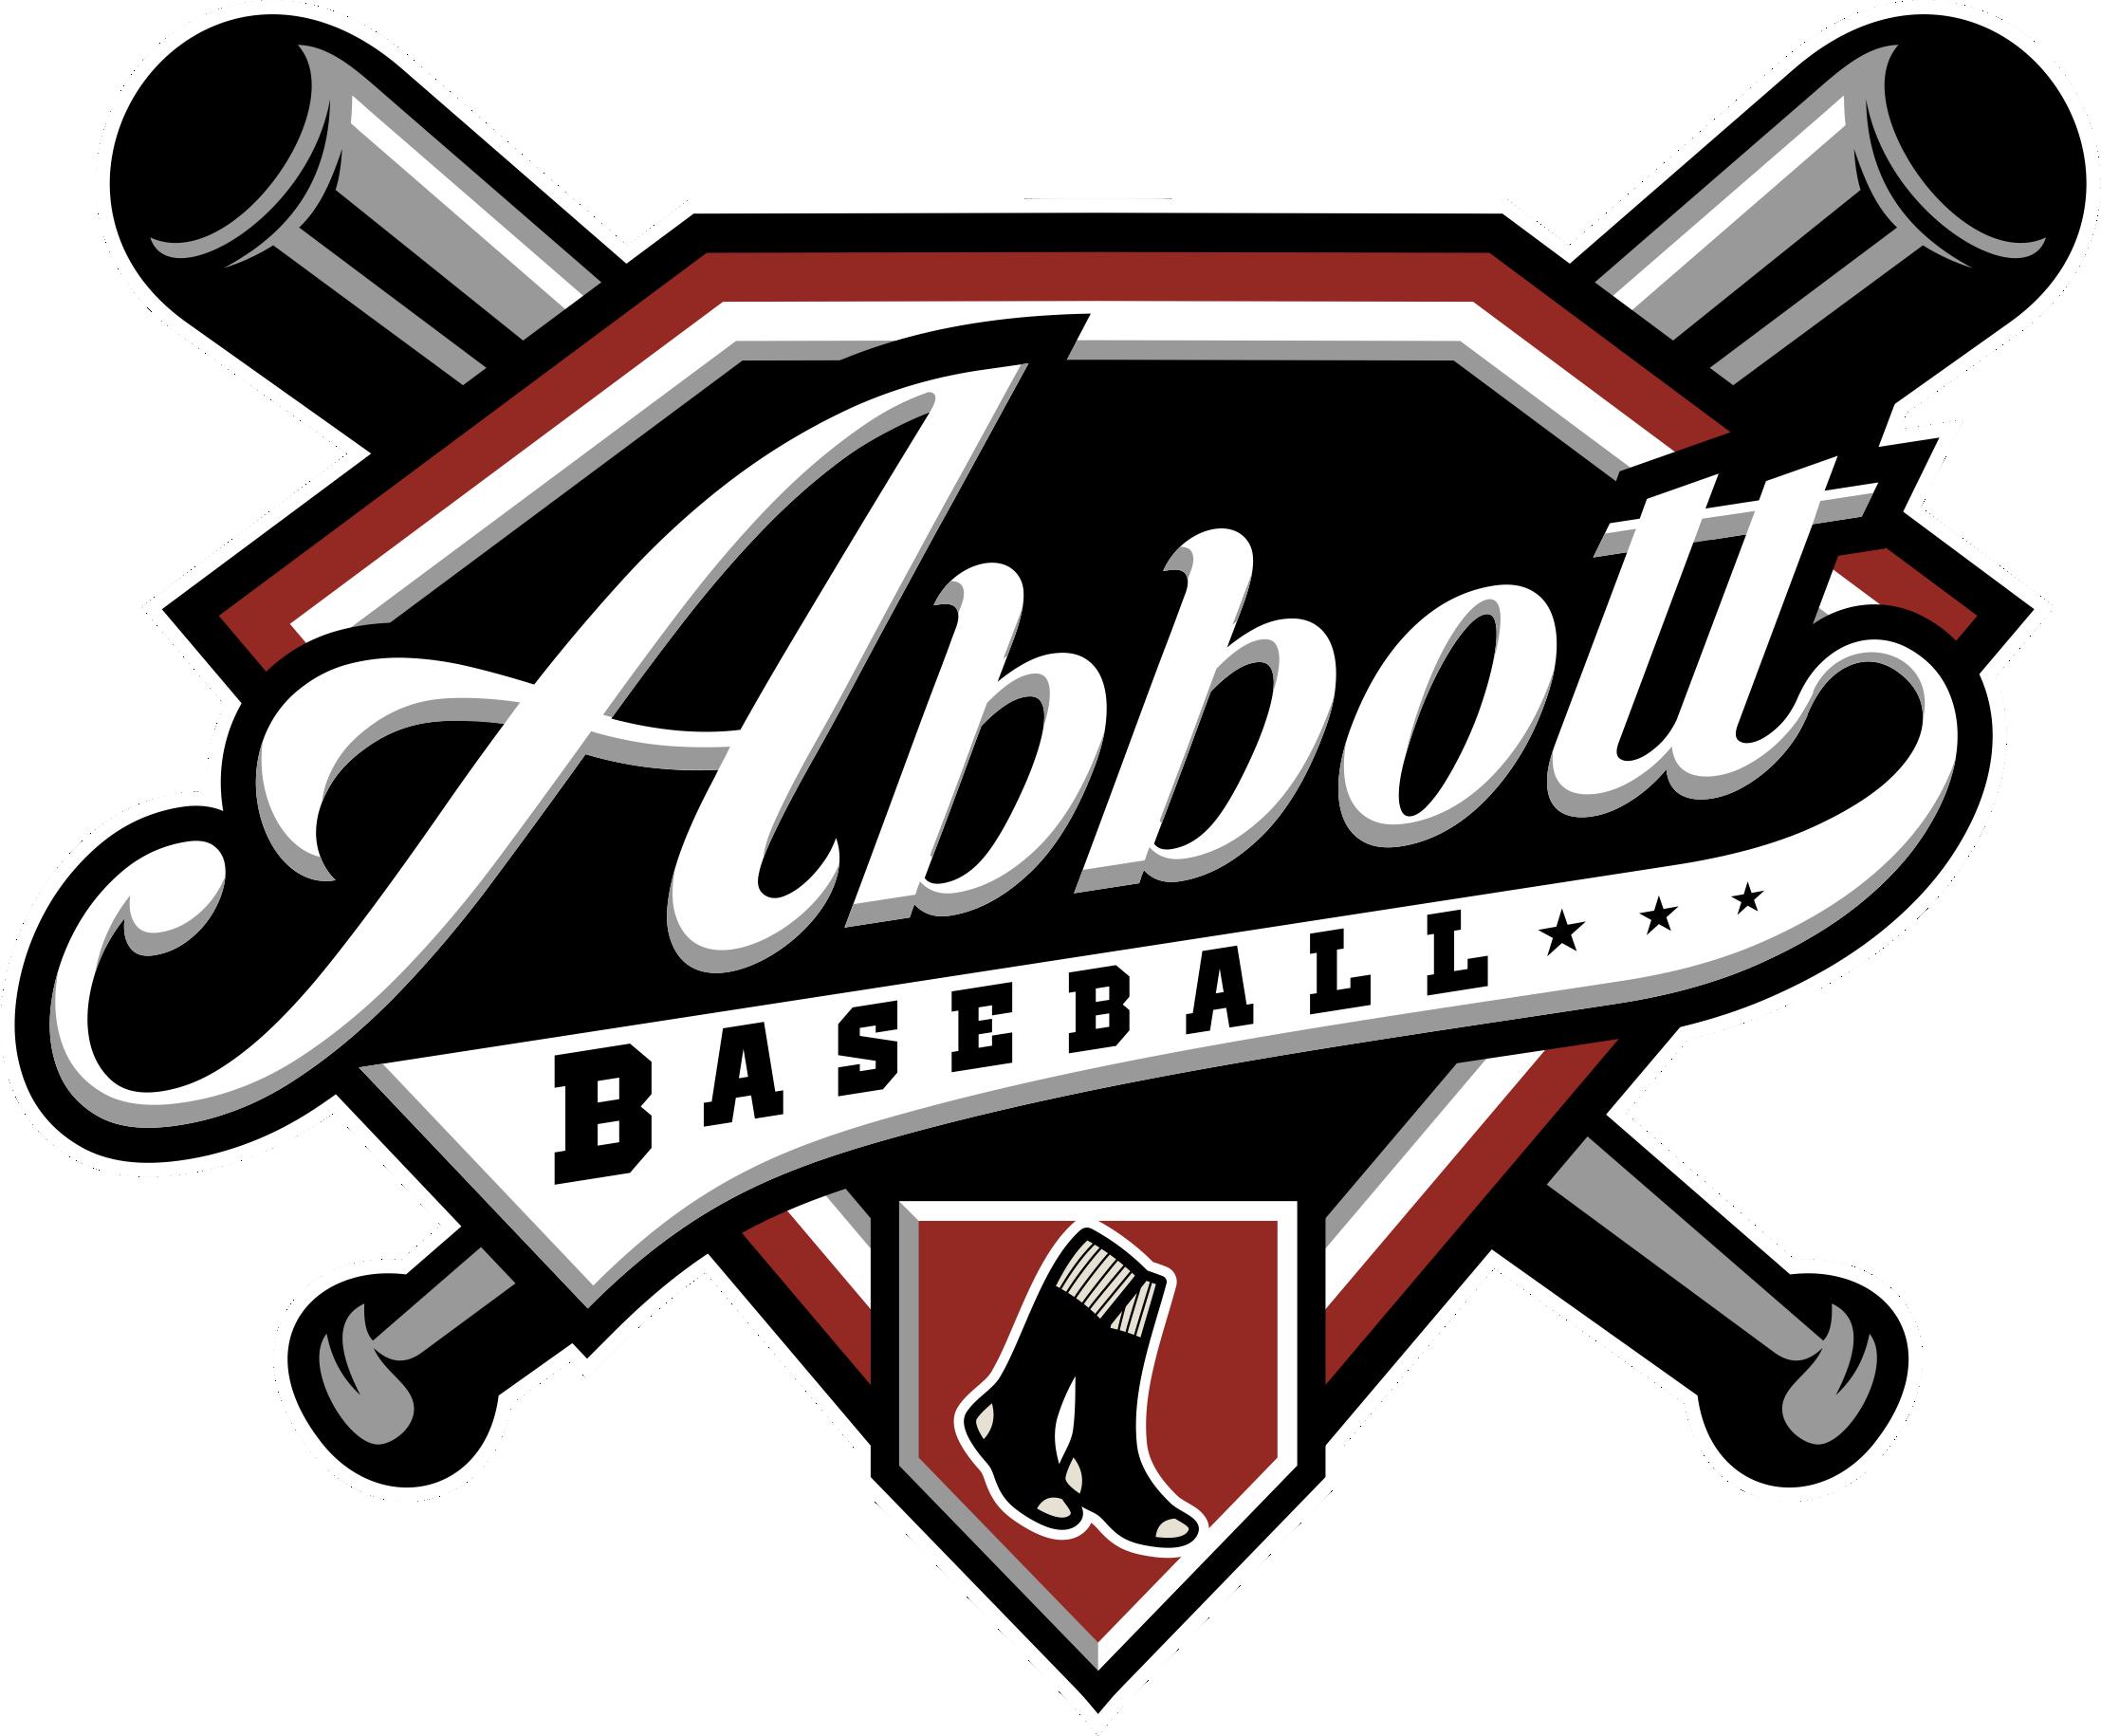 Design a unique vintage/ throwback logo for baseball team